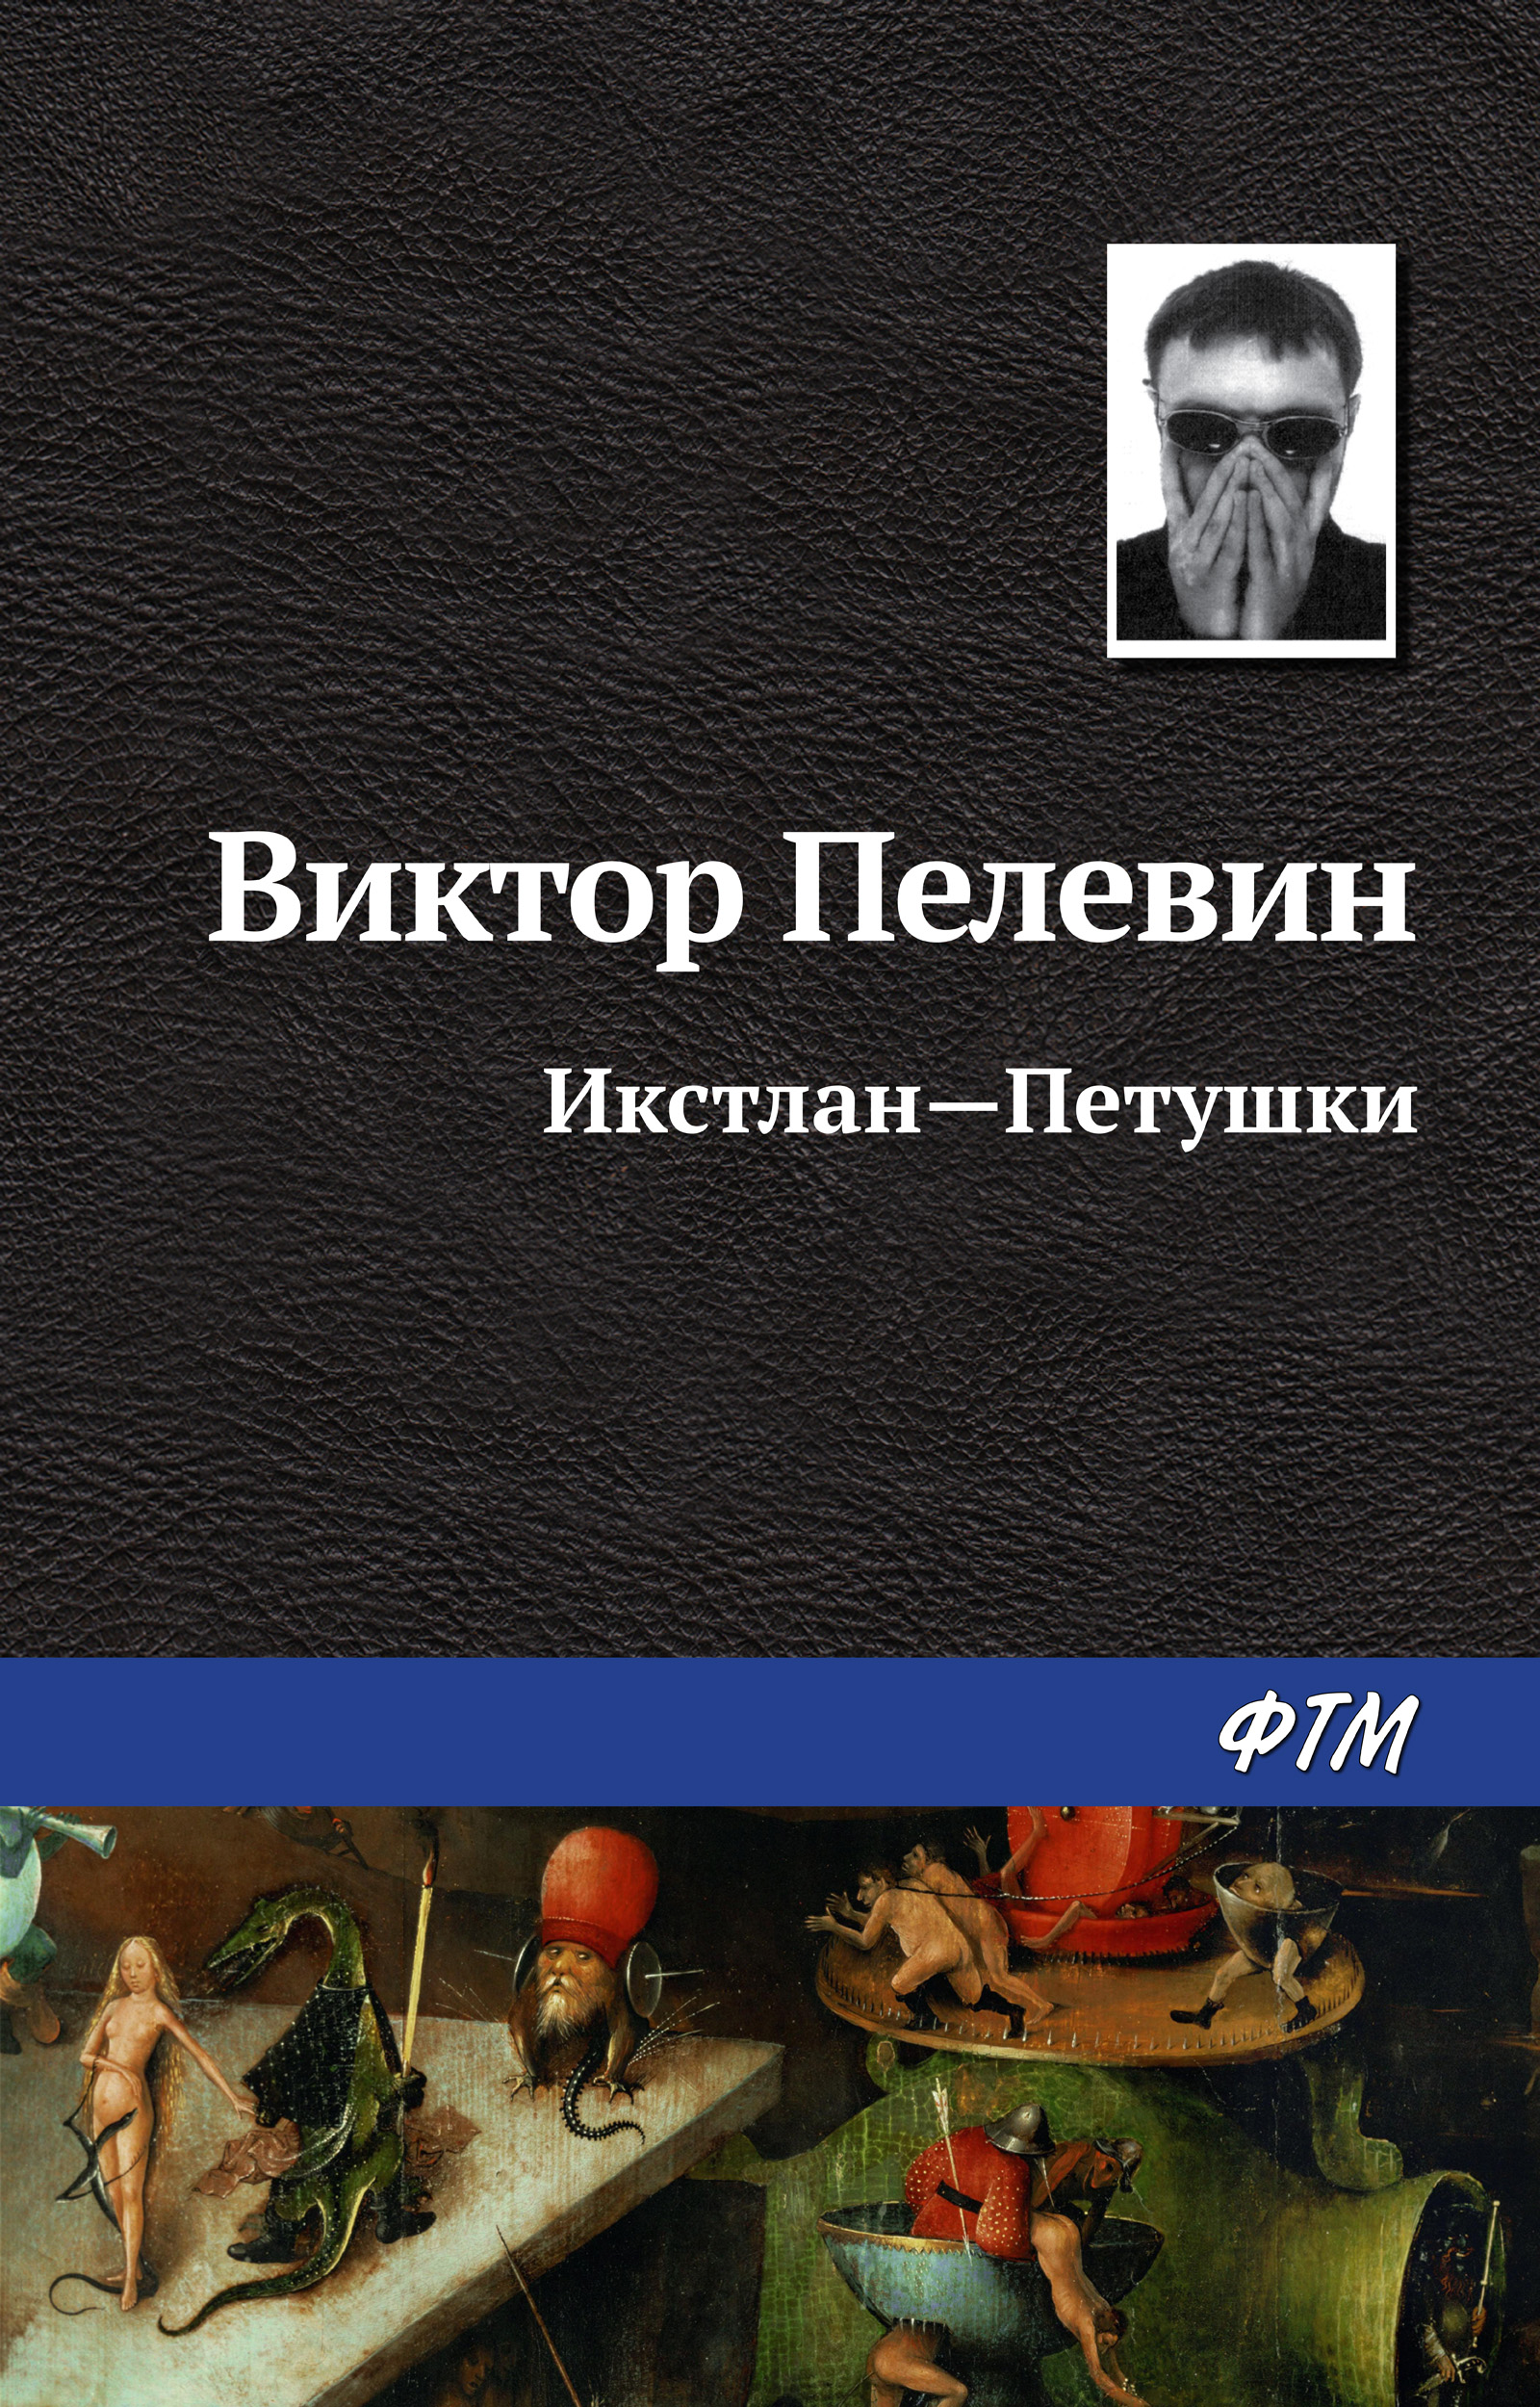 Виктор Пелевин Икстлан – Петушки виктор пелевин икстлан – петушки